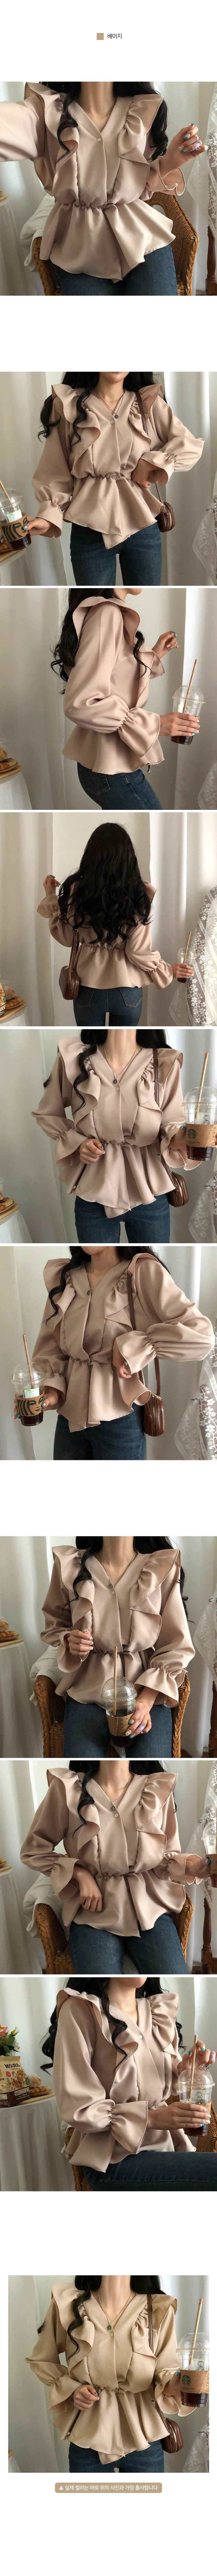 ruffle v flared blouse